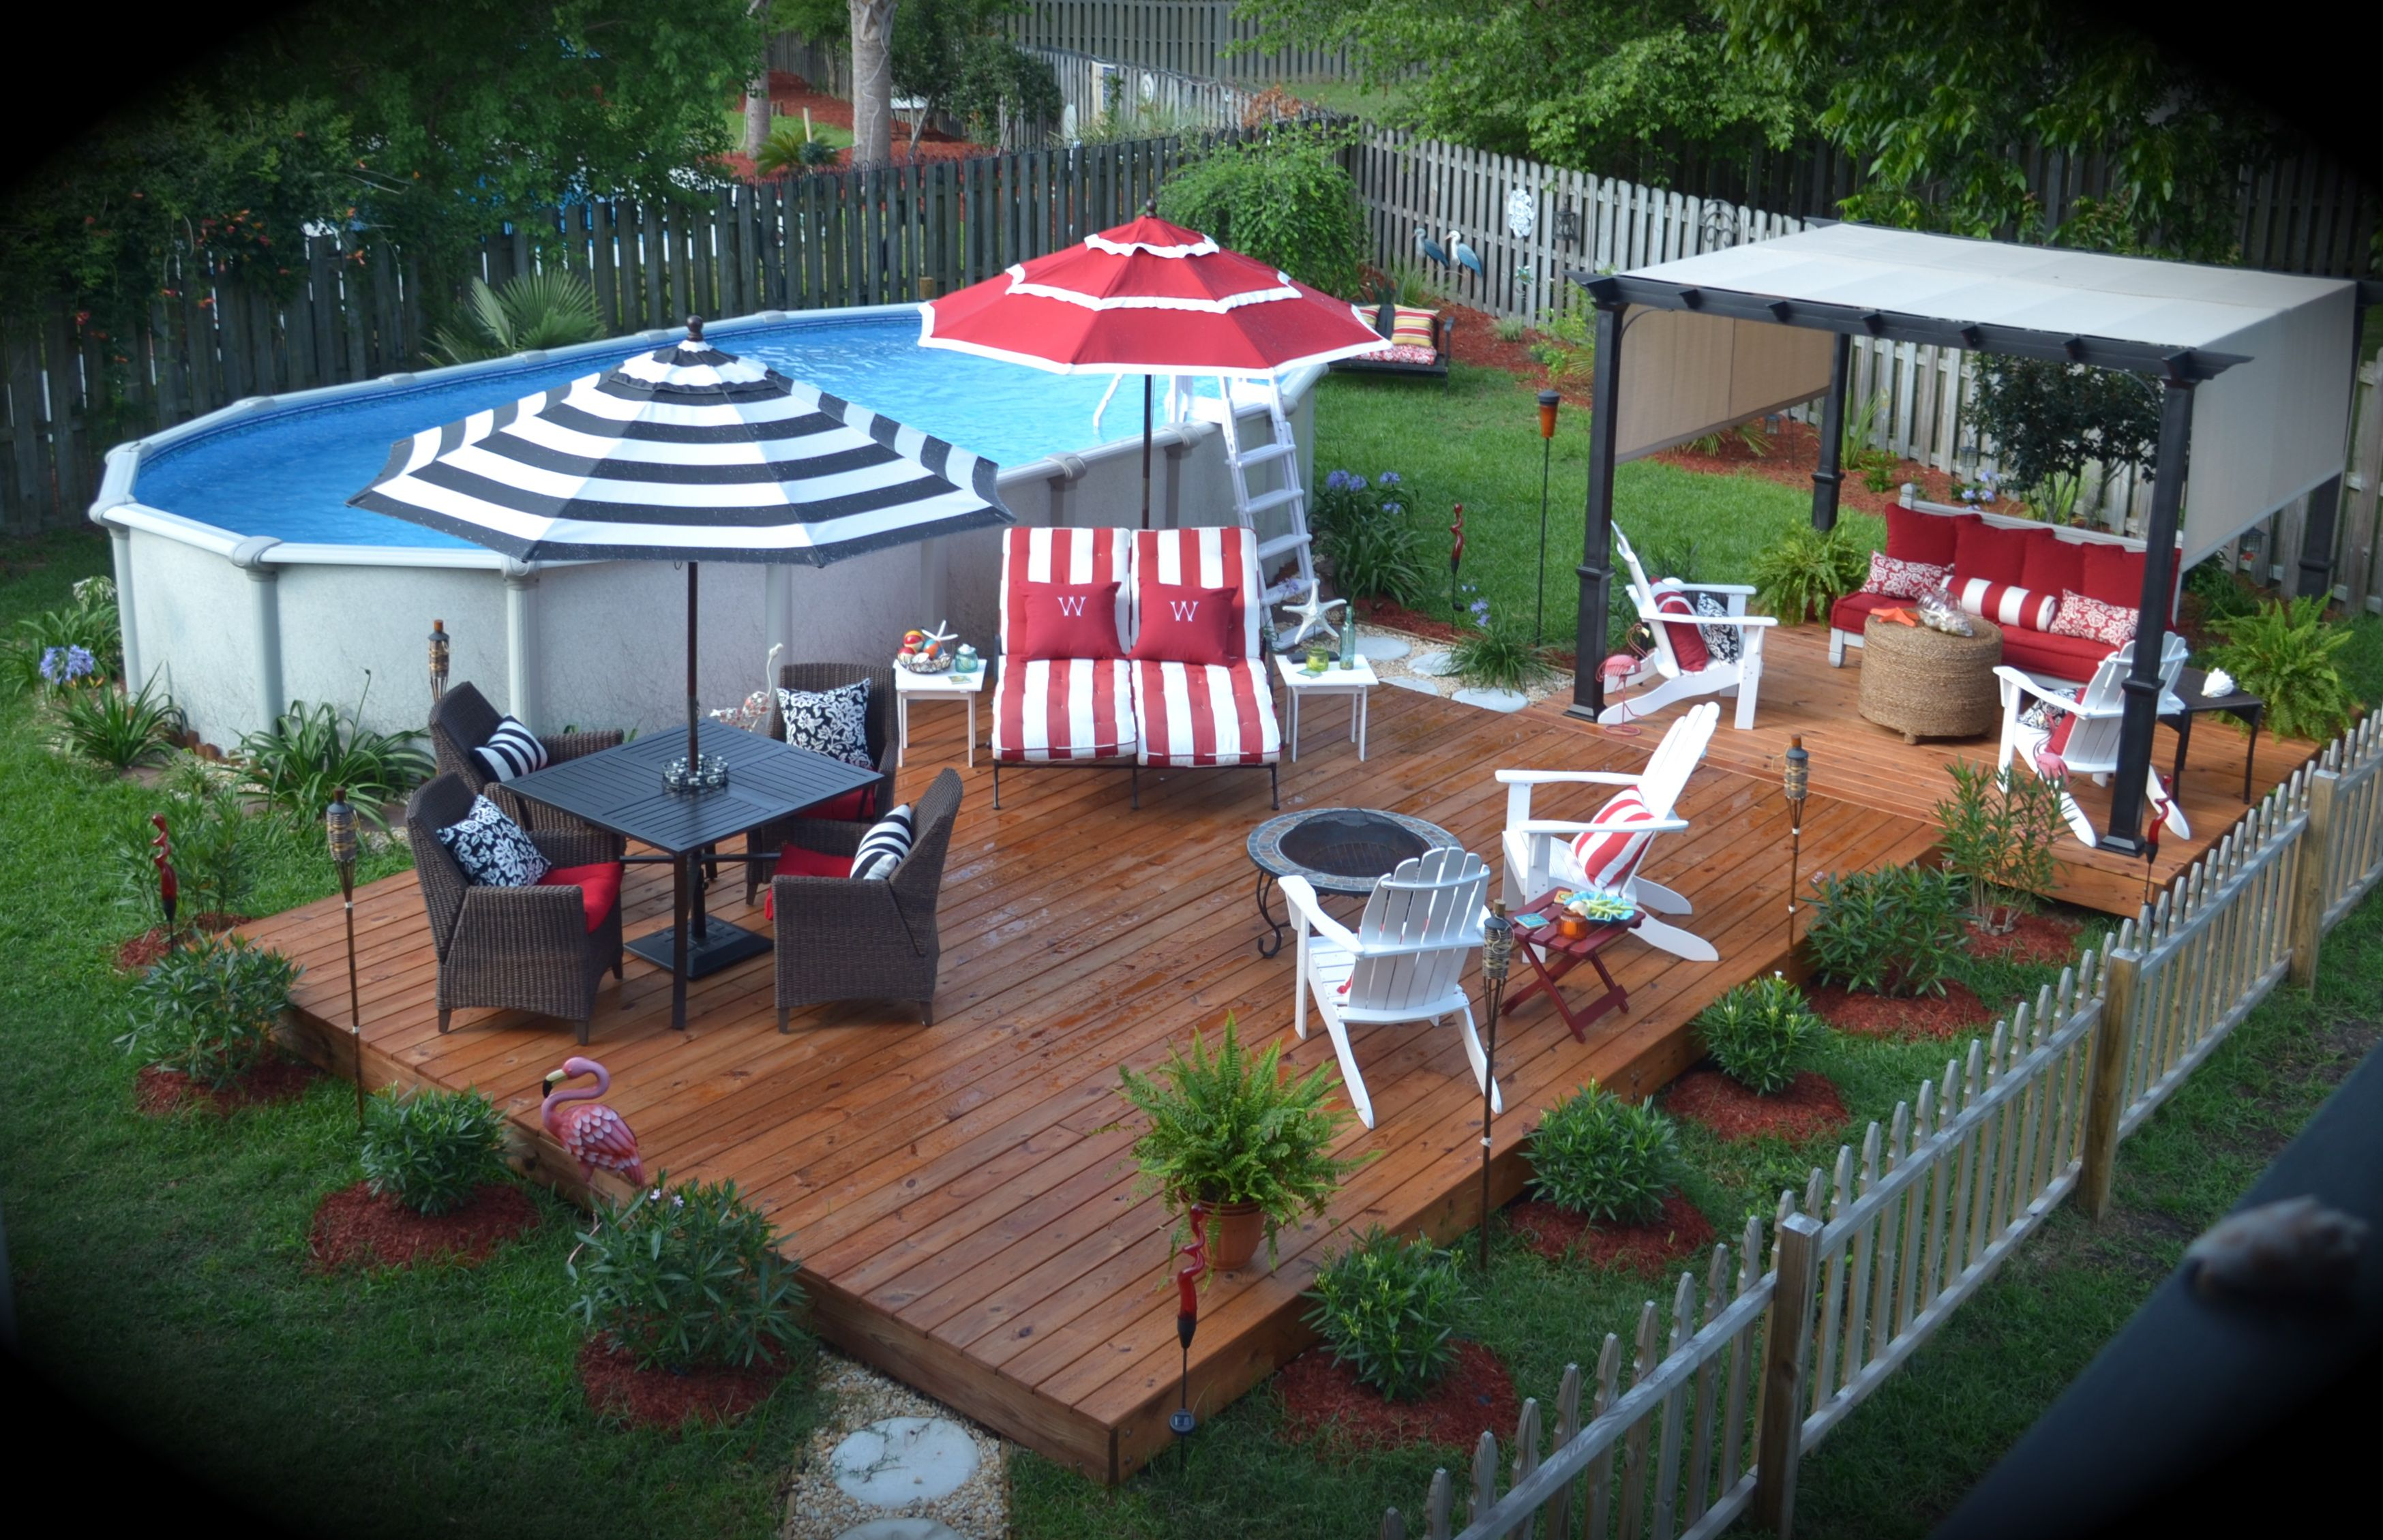 Pin by Priscilla Witt on Backyard Ideas Backyard pool